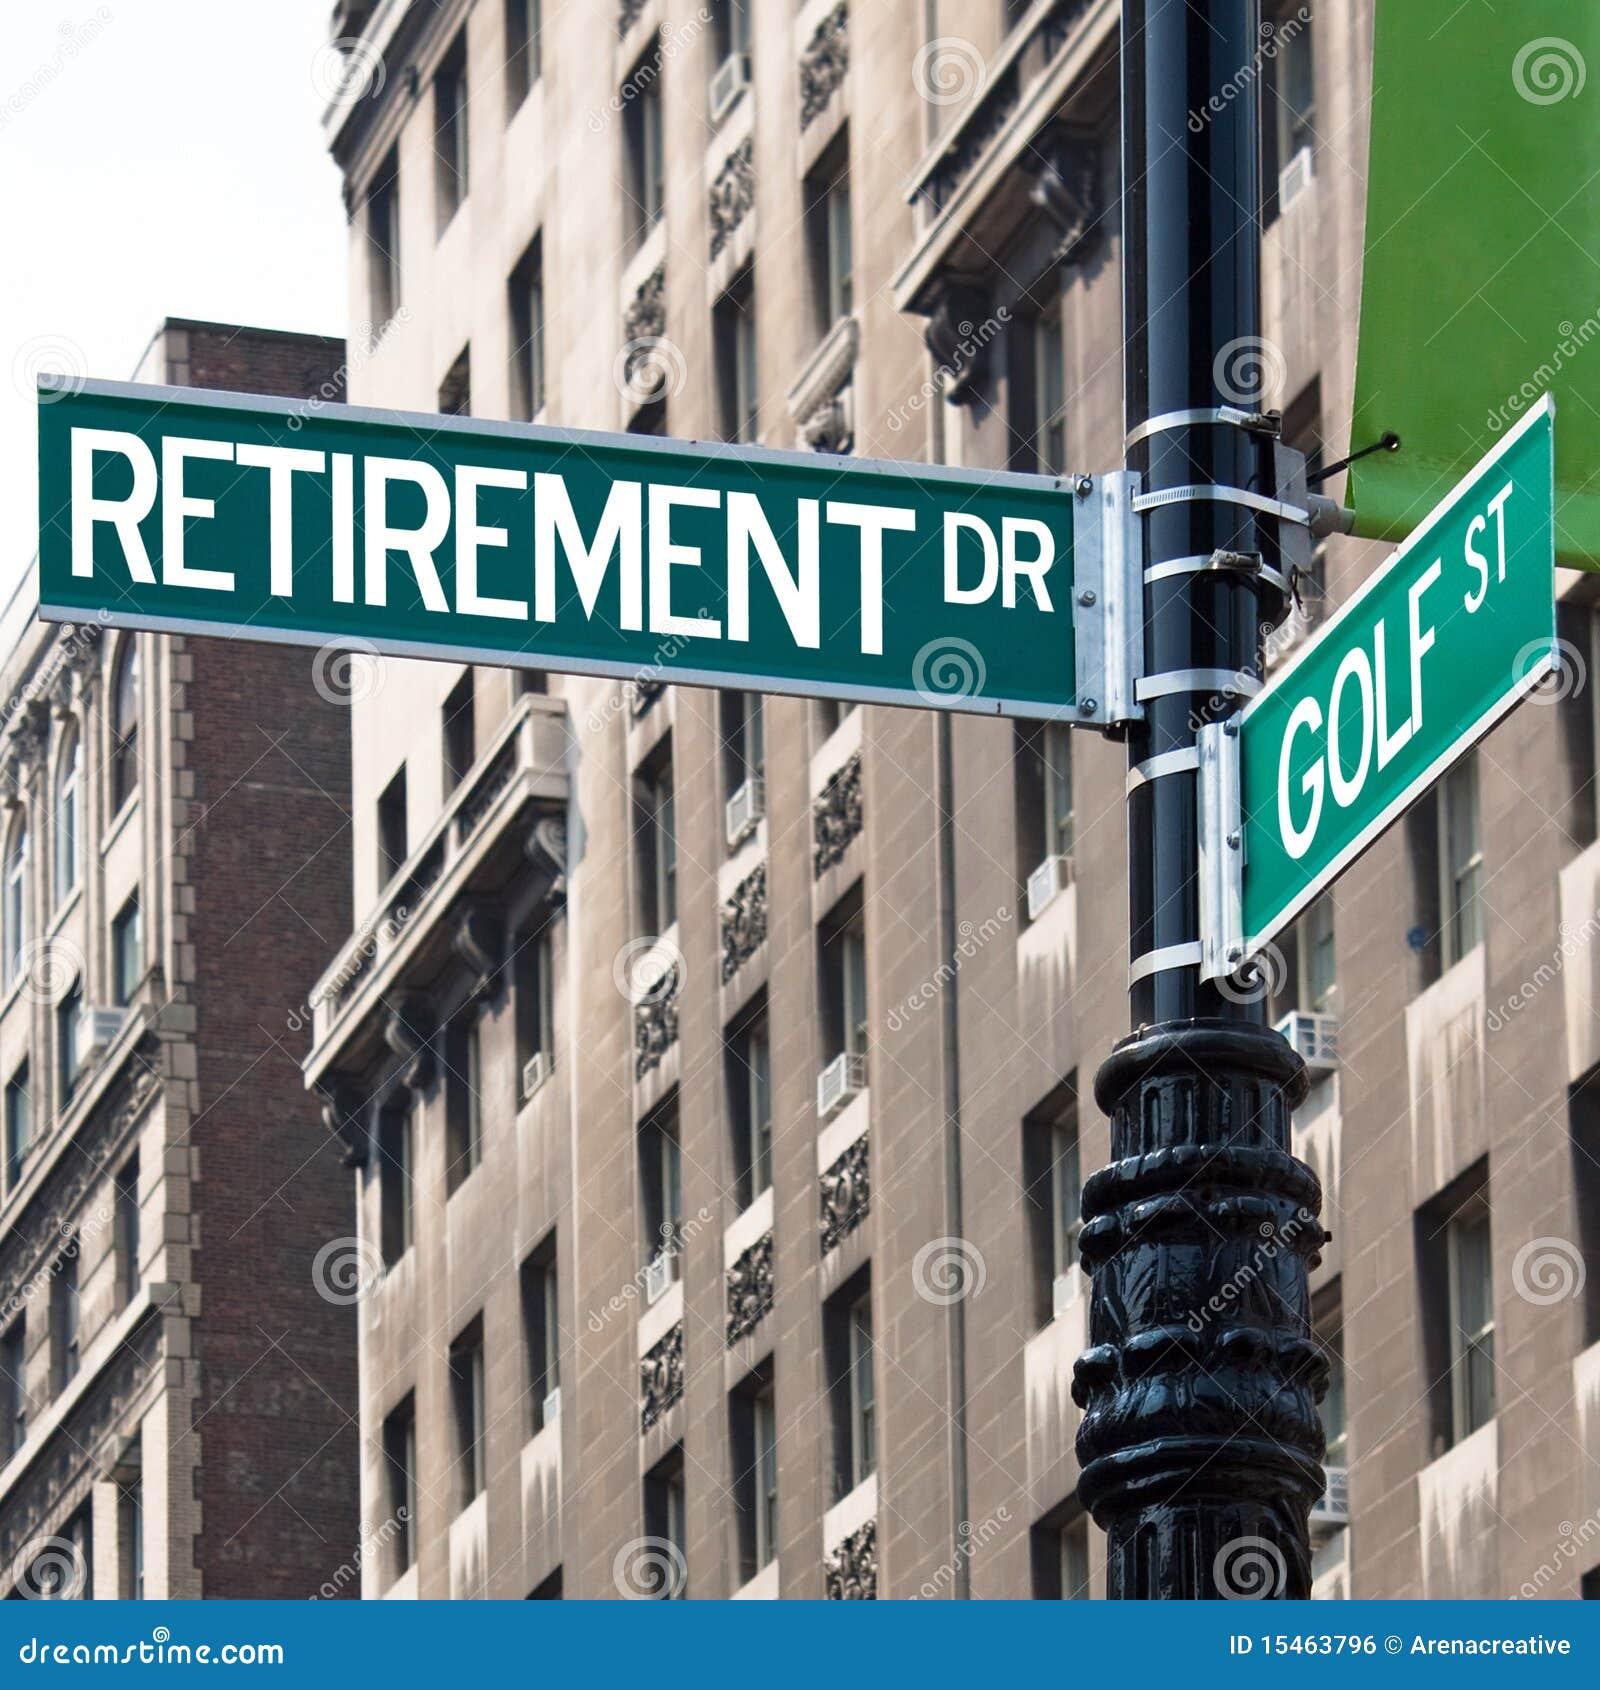 Retirement Golf Street Signs